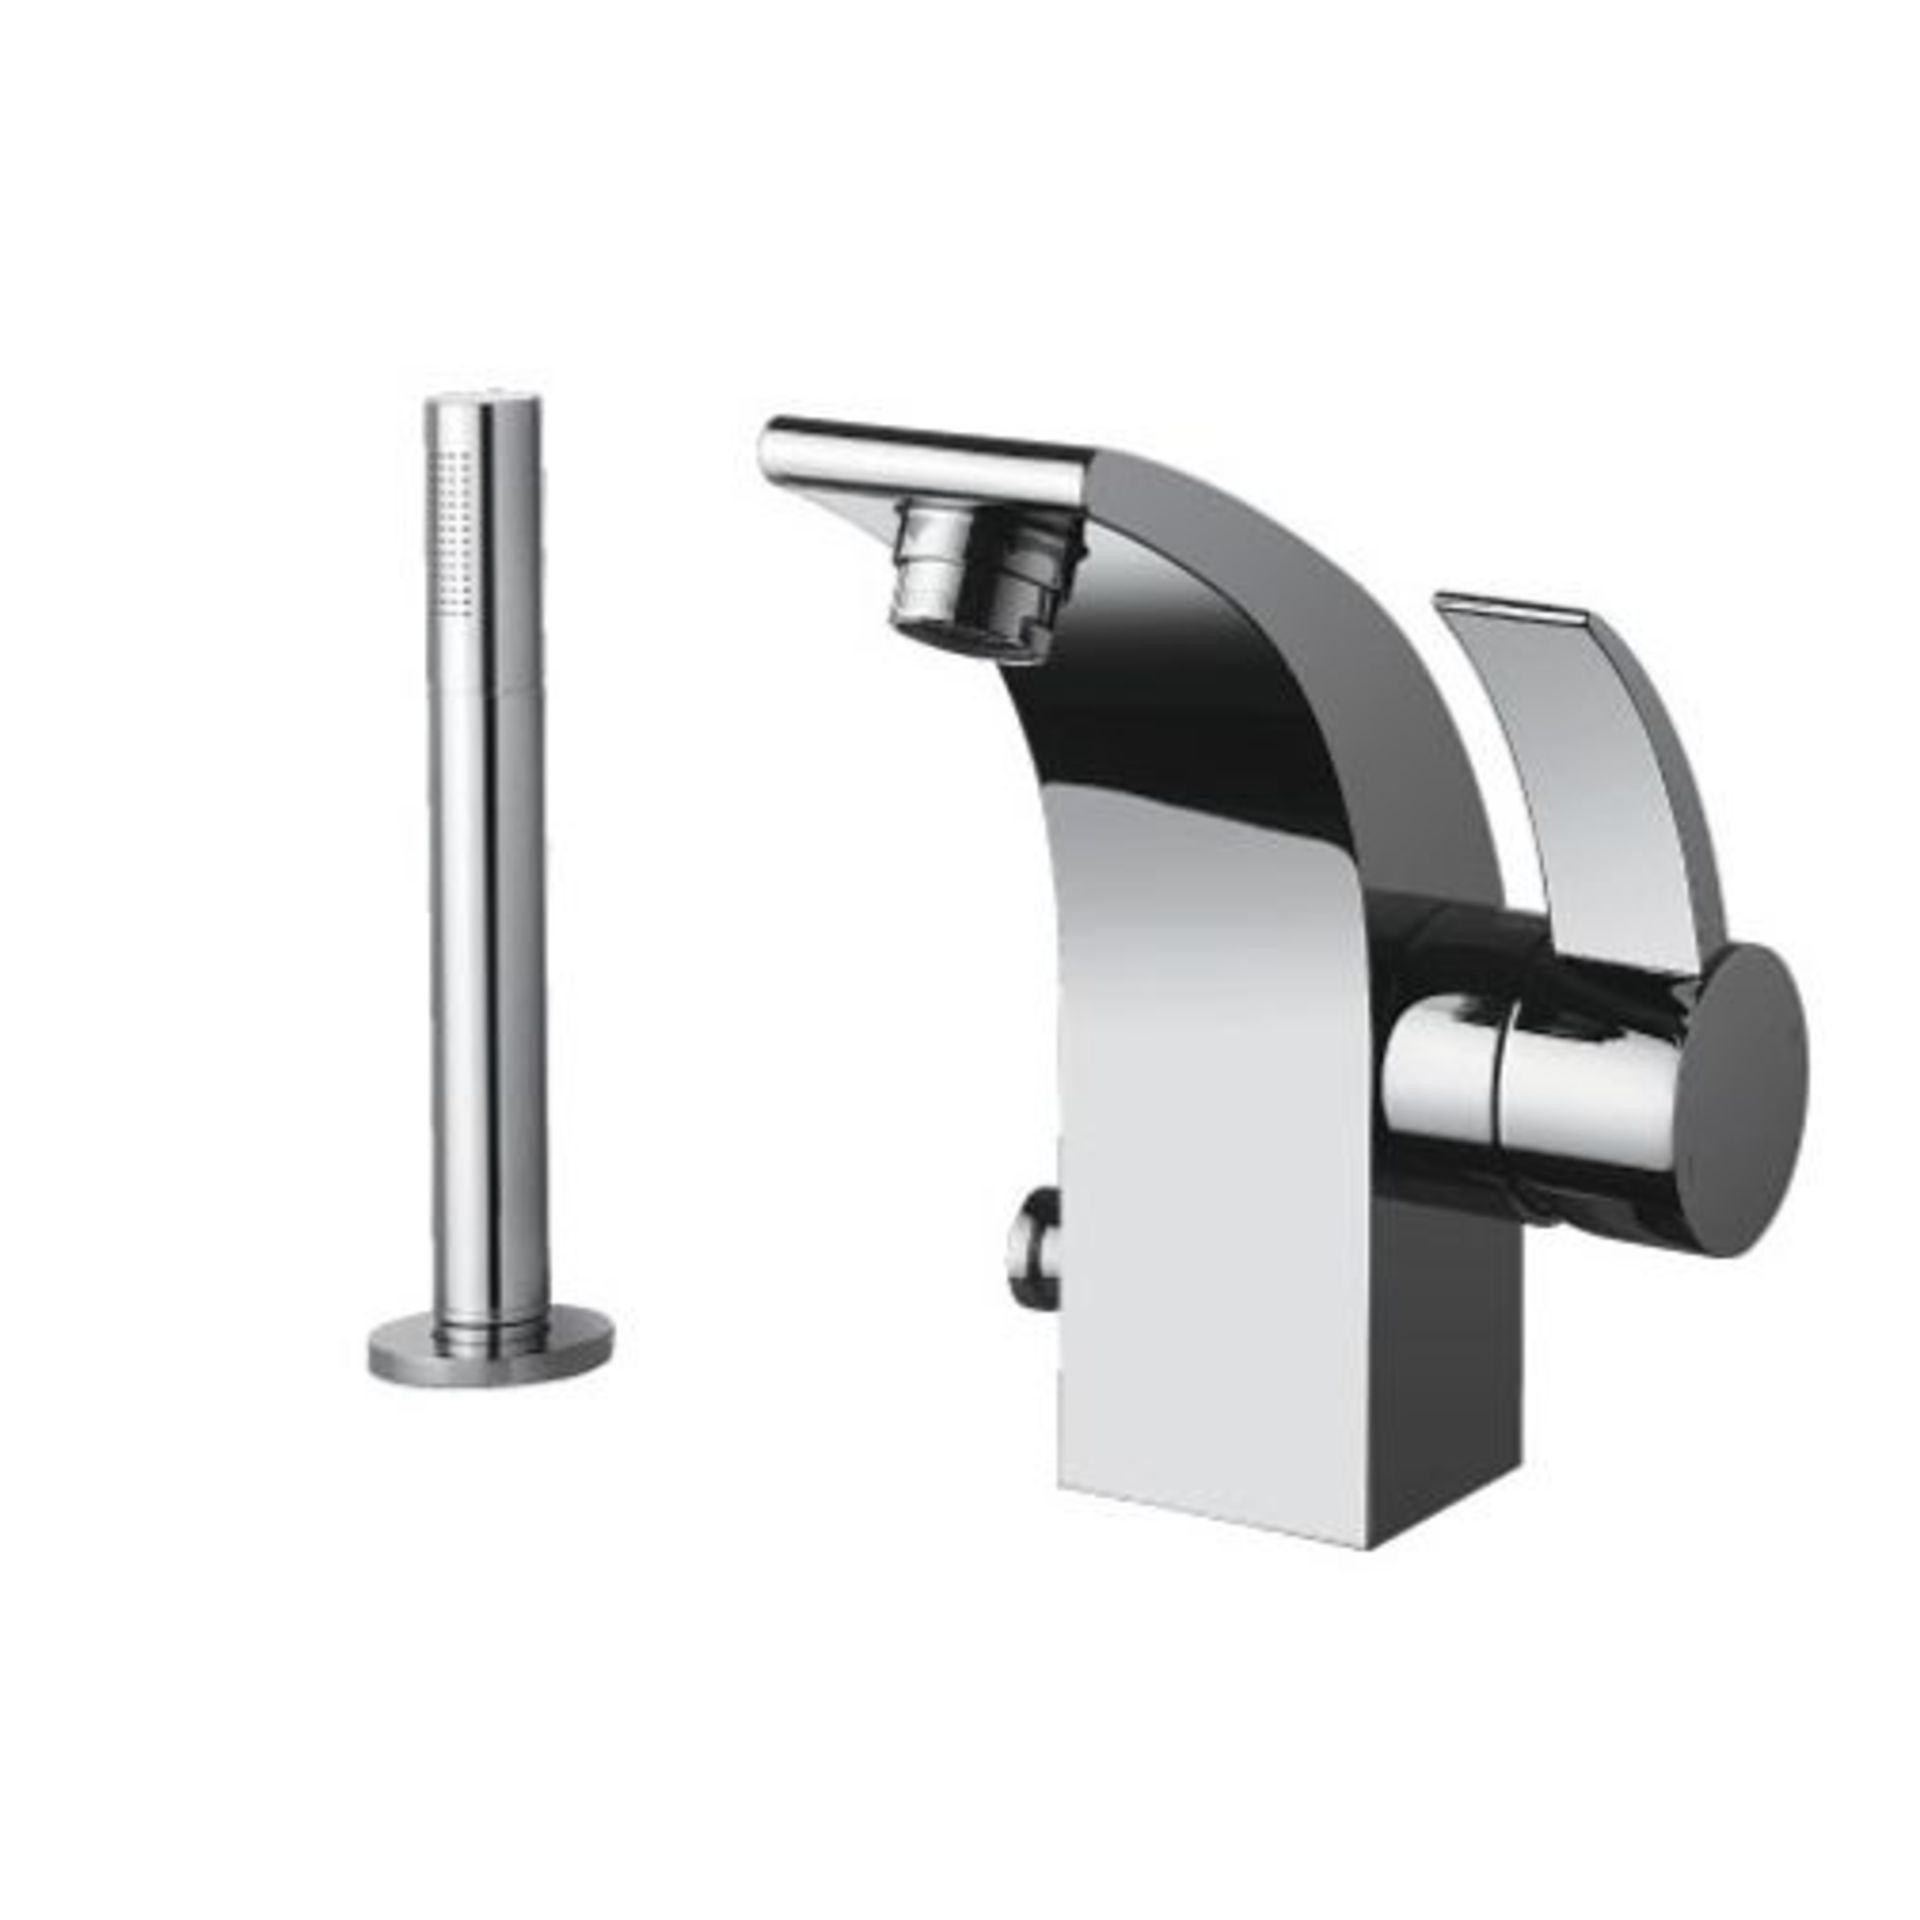 Lot 7 - Bathstore 'Sublime' very high quality, designer bath & shower mono mixer tap.